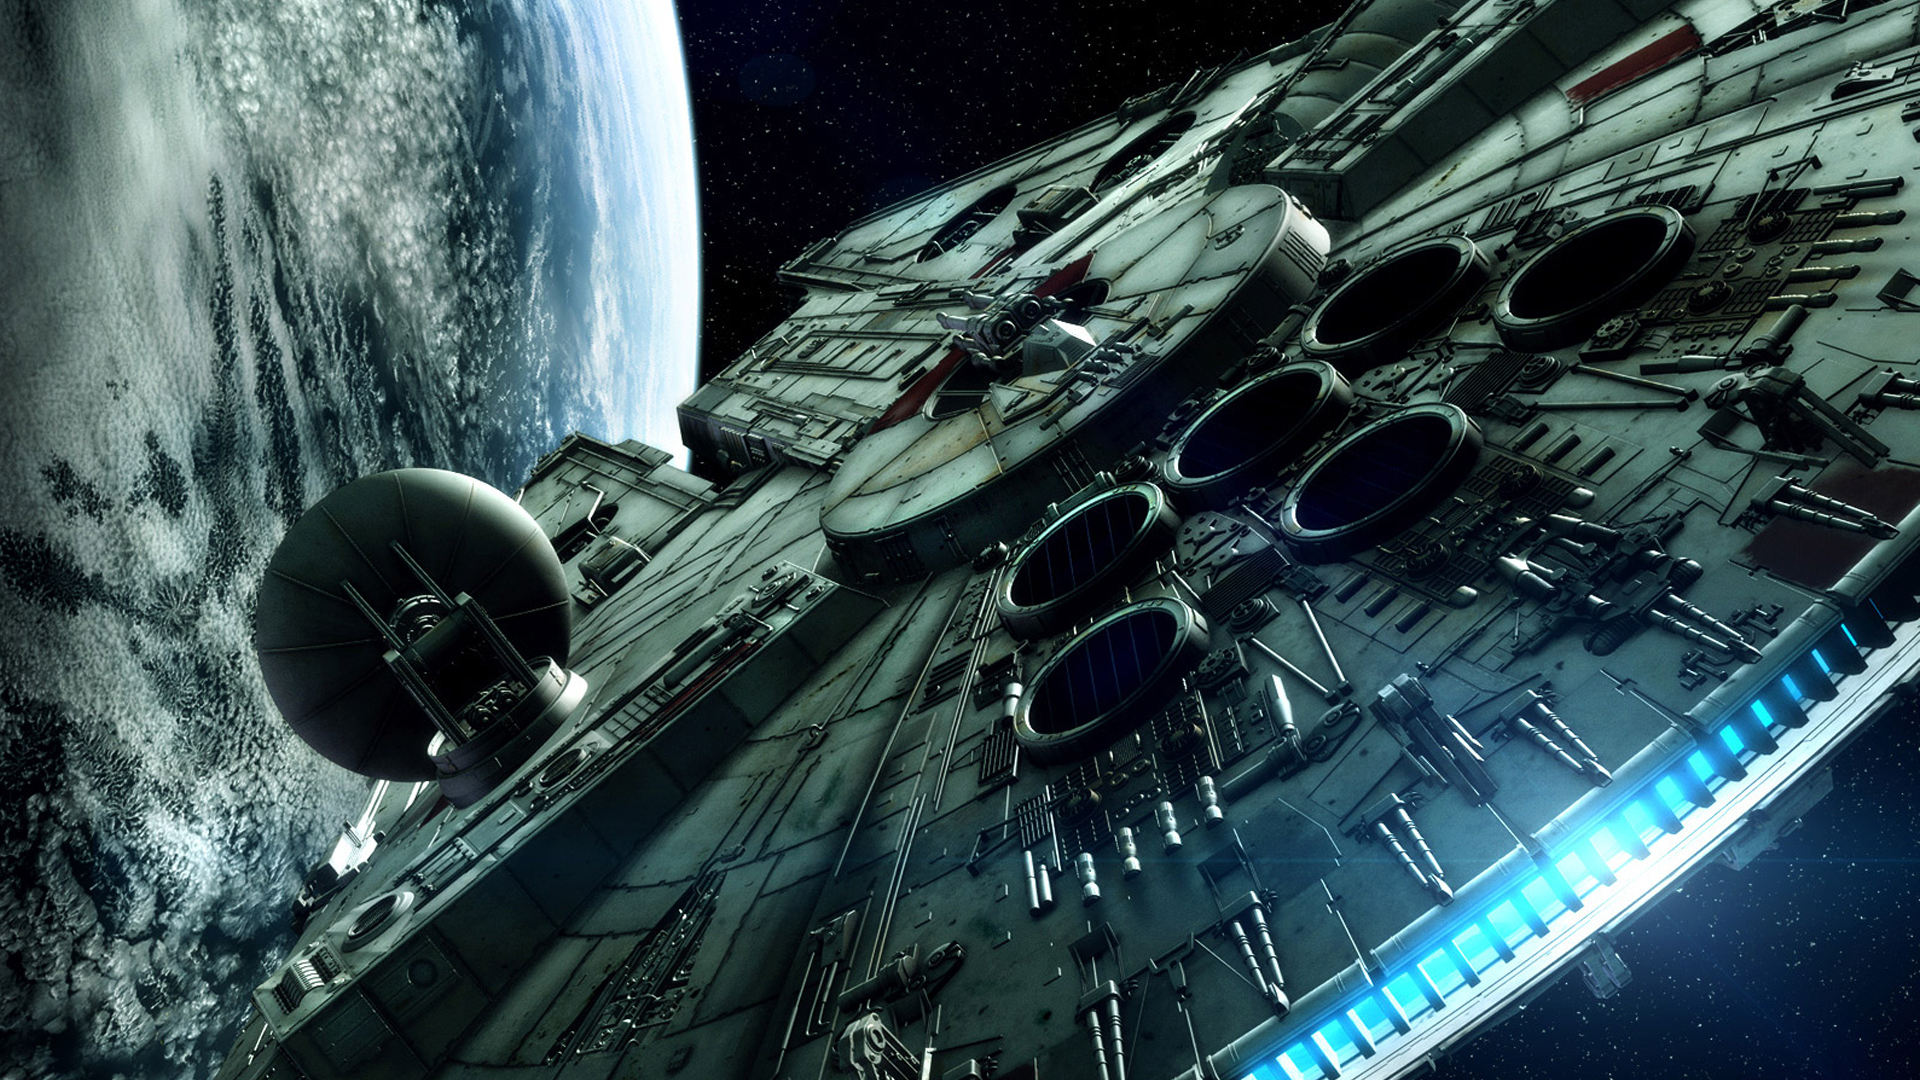 ... war movie free download fbulous hd widescreen wallpapers of star wars